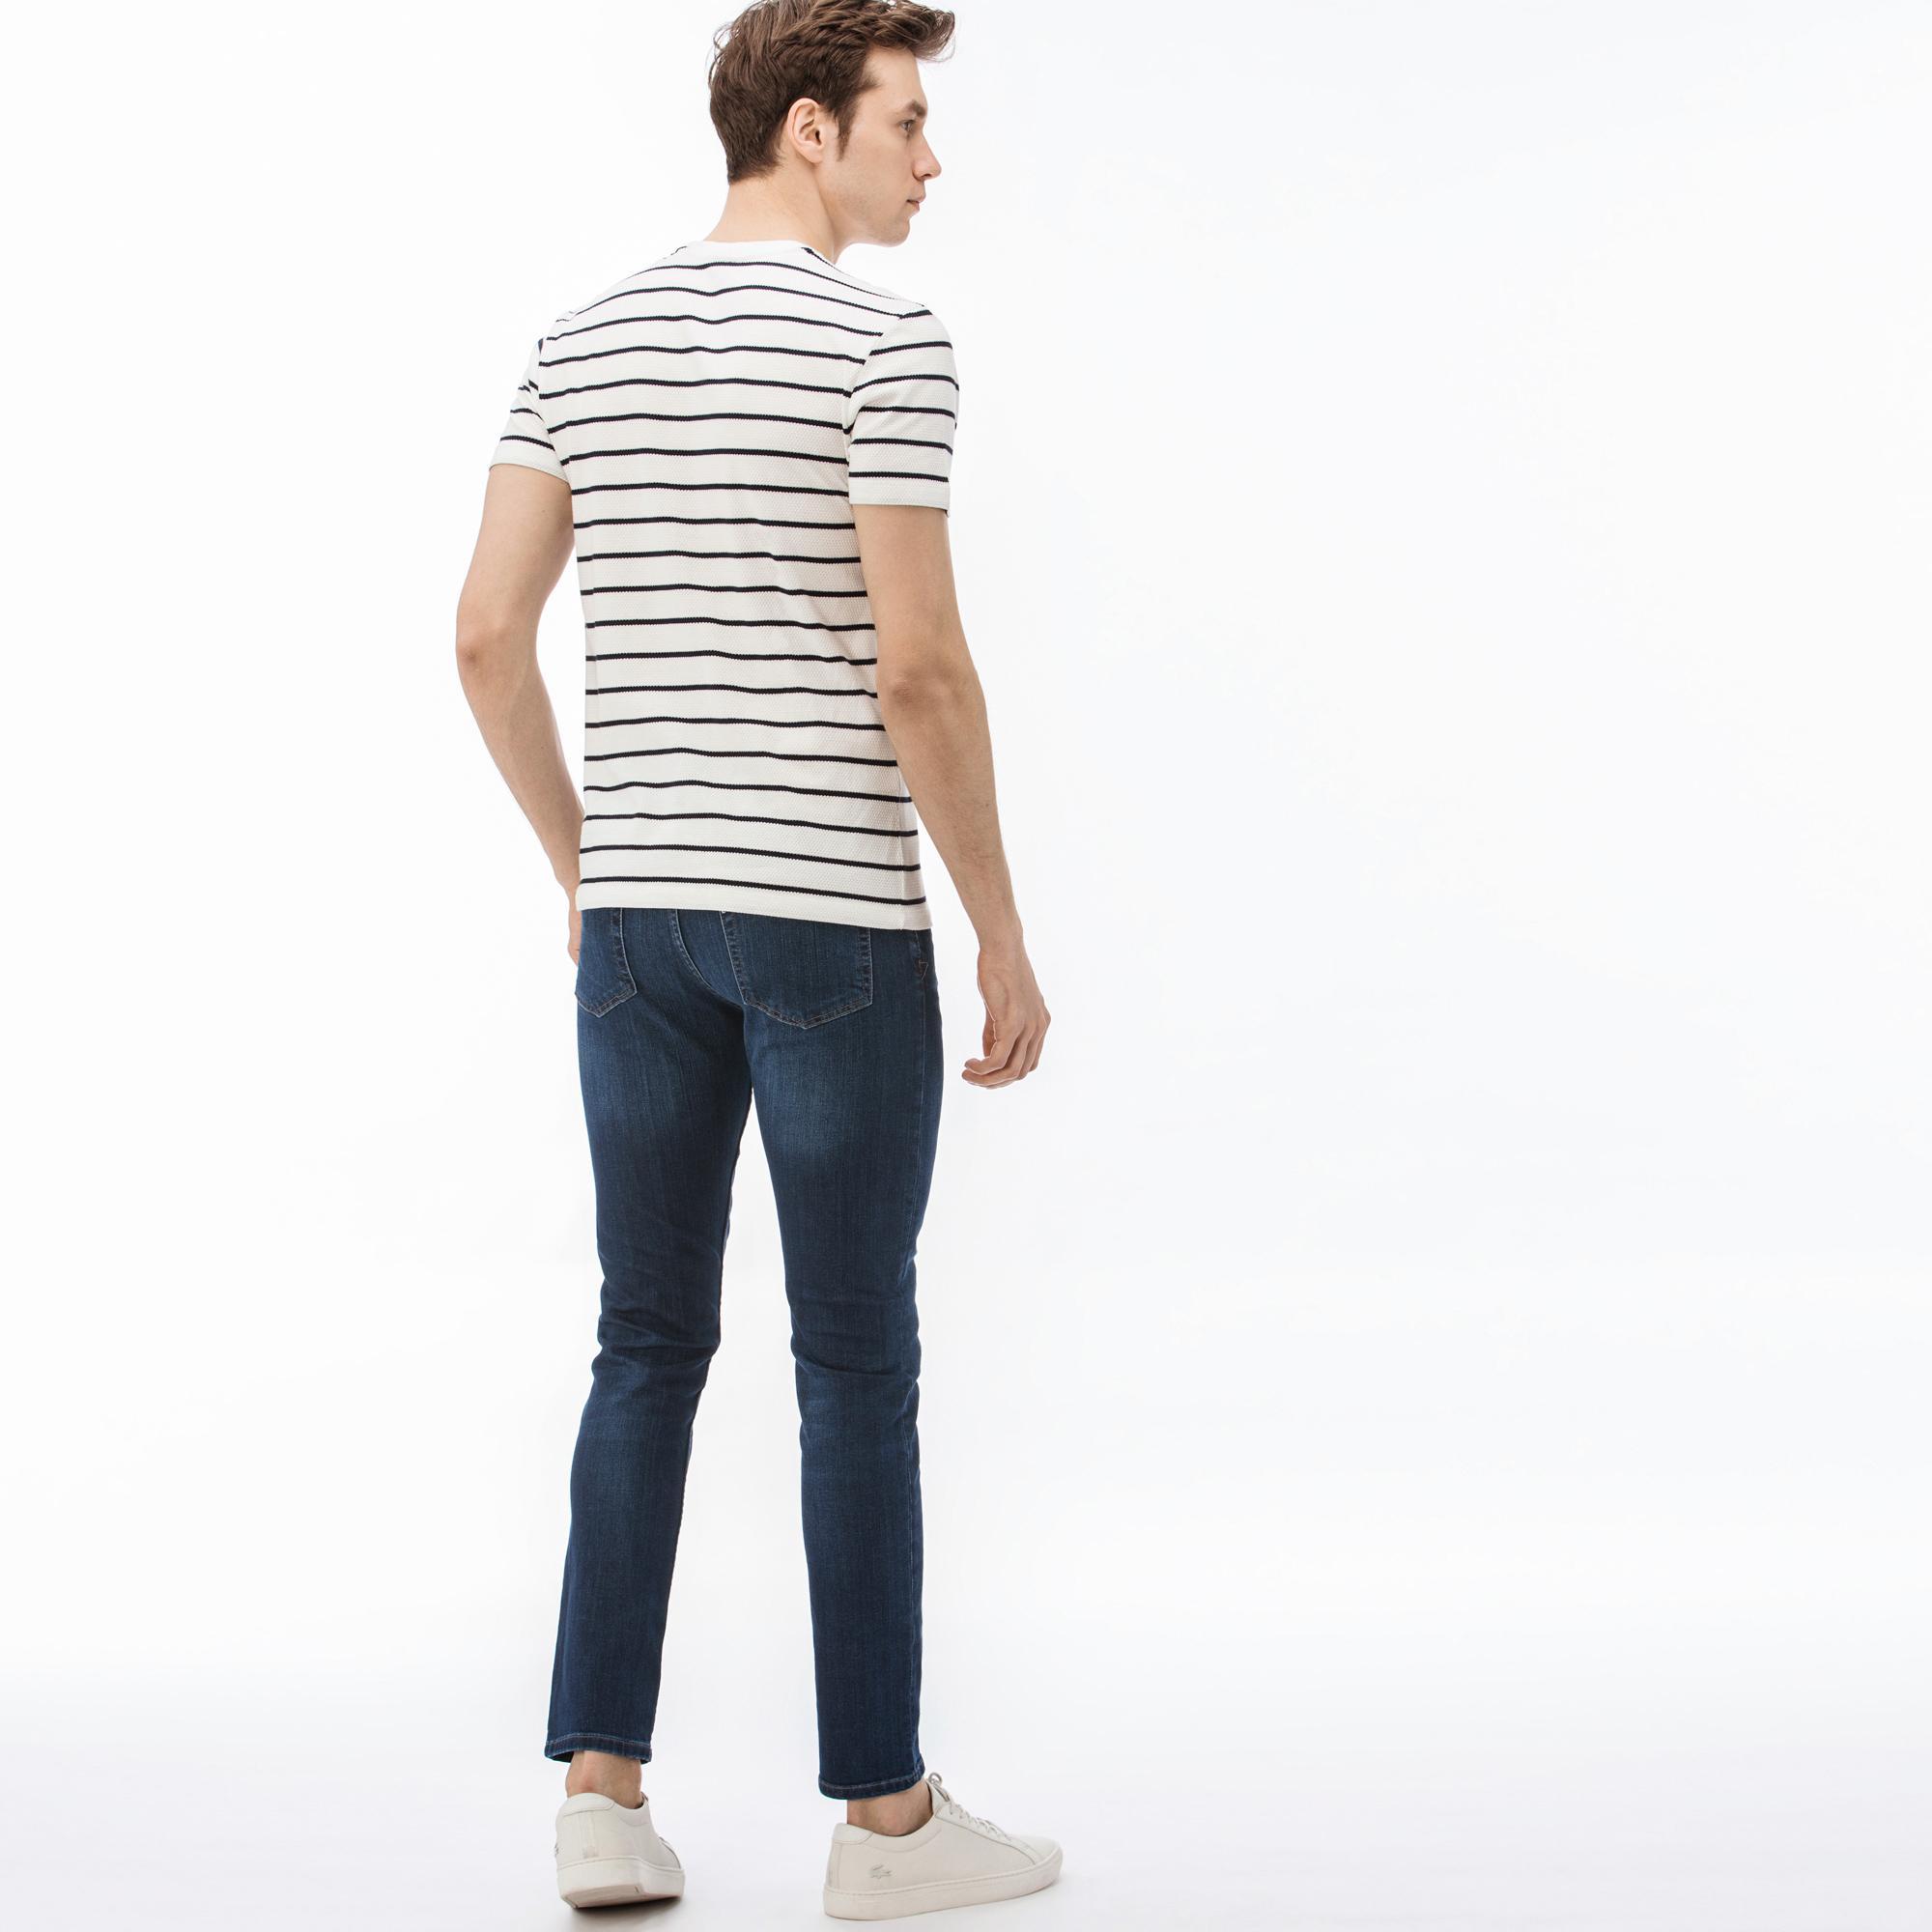 Lacoste Erkek Slim Fit Denim Pantolon